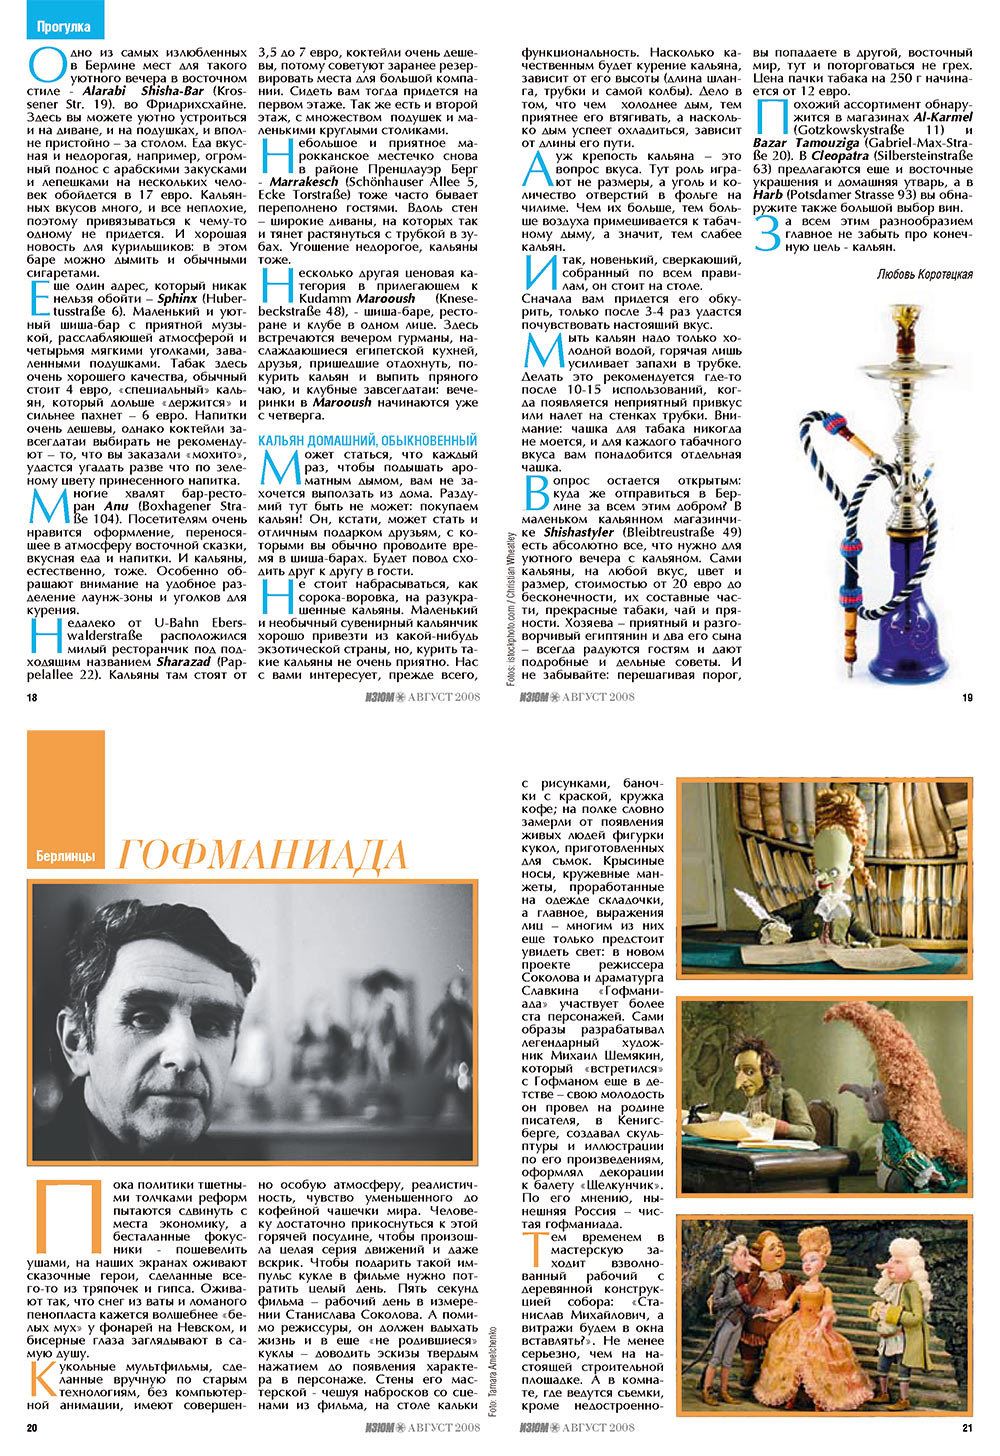 Изюм (журнал). 2008 год, номер 8, стр. 6